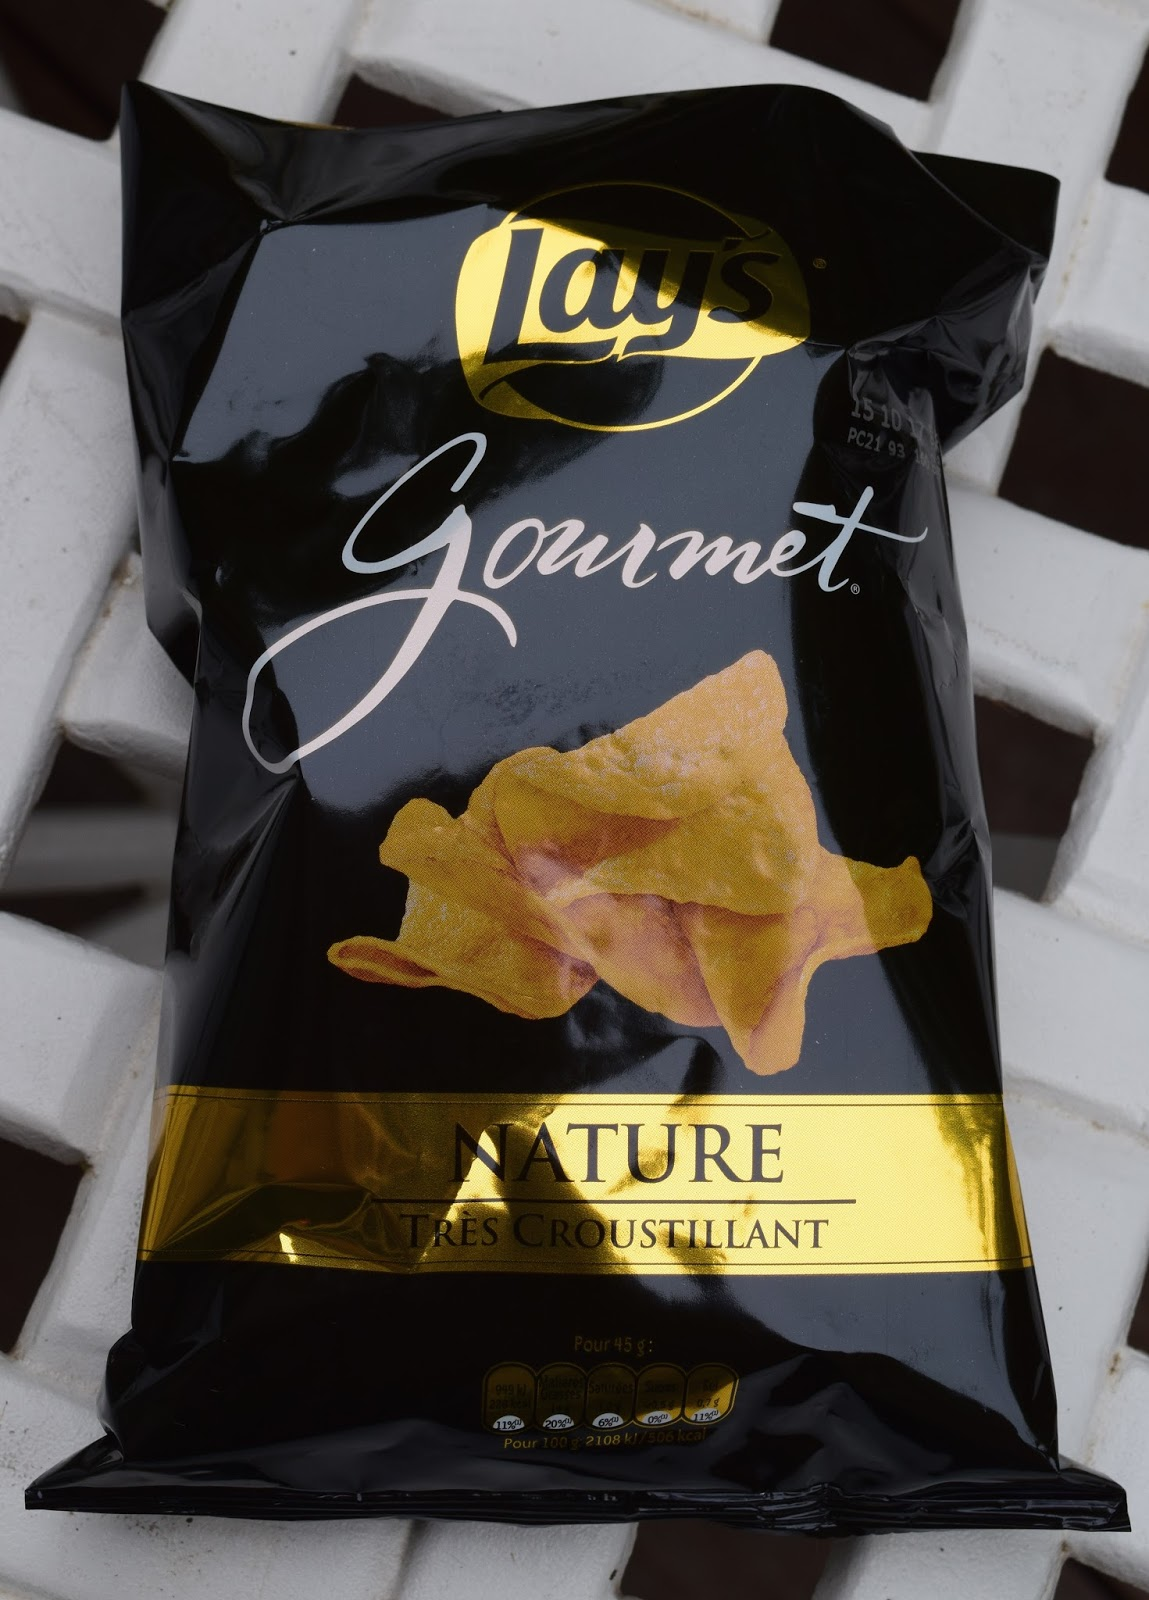 Lay's Gourmet Nature Très Croustillant